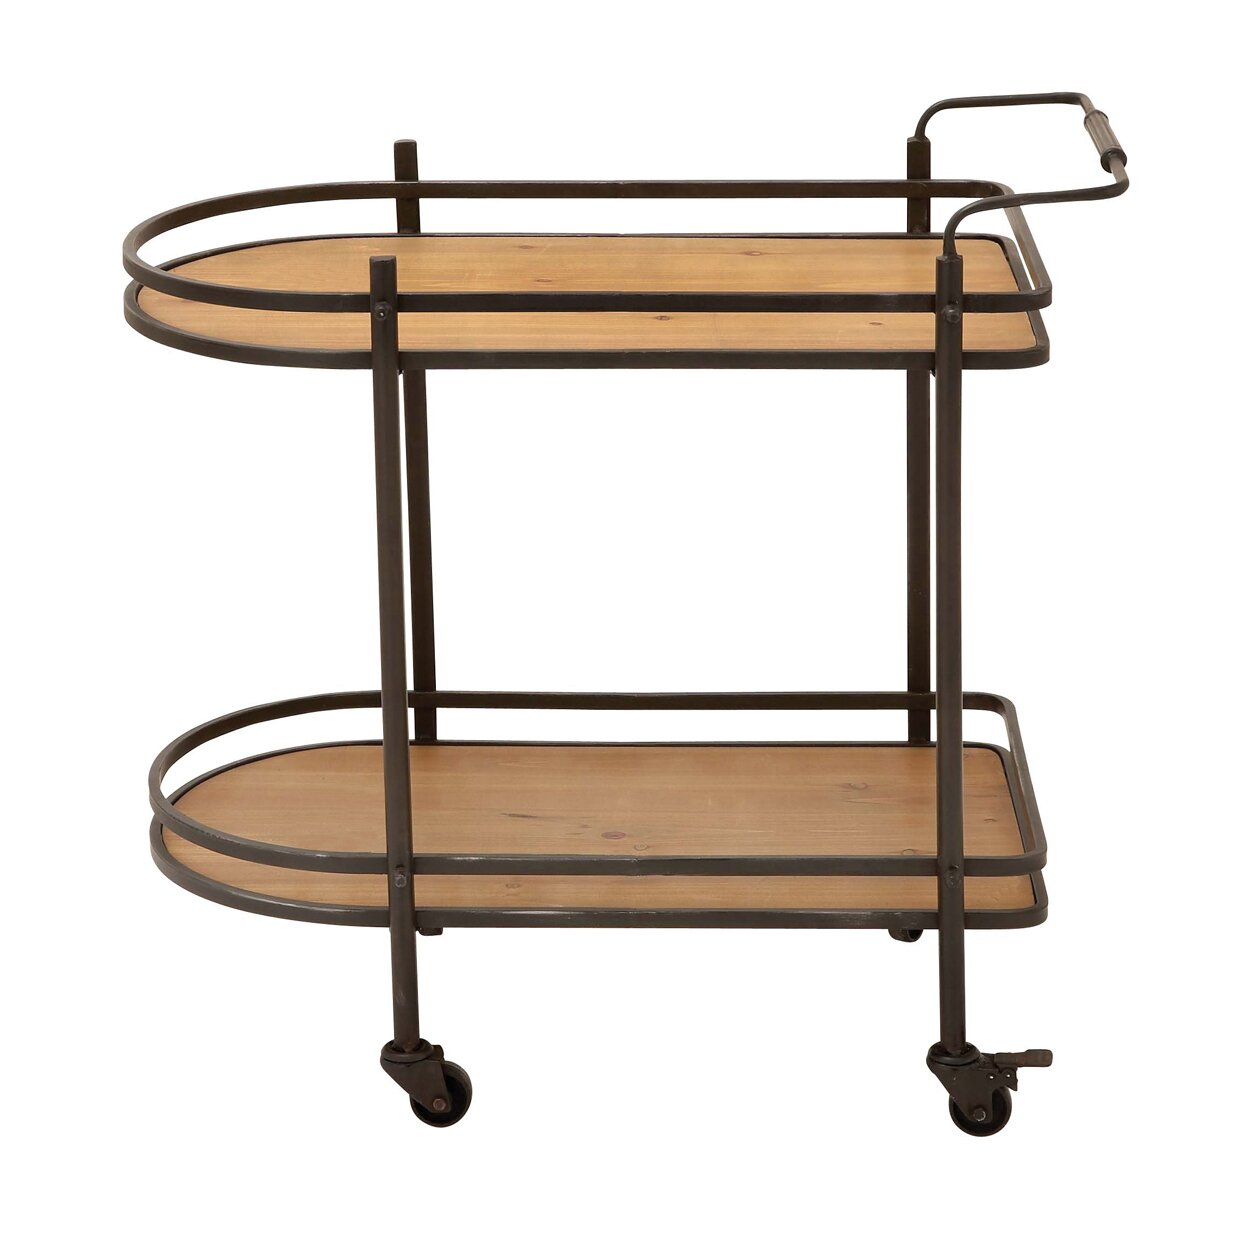 Ec world imports mobile tea serving and kitchen bar cart for Mobili bar cart